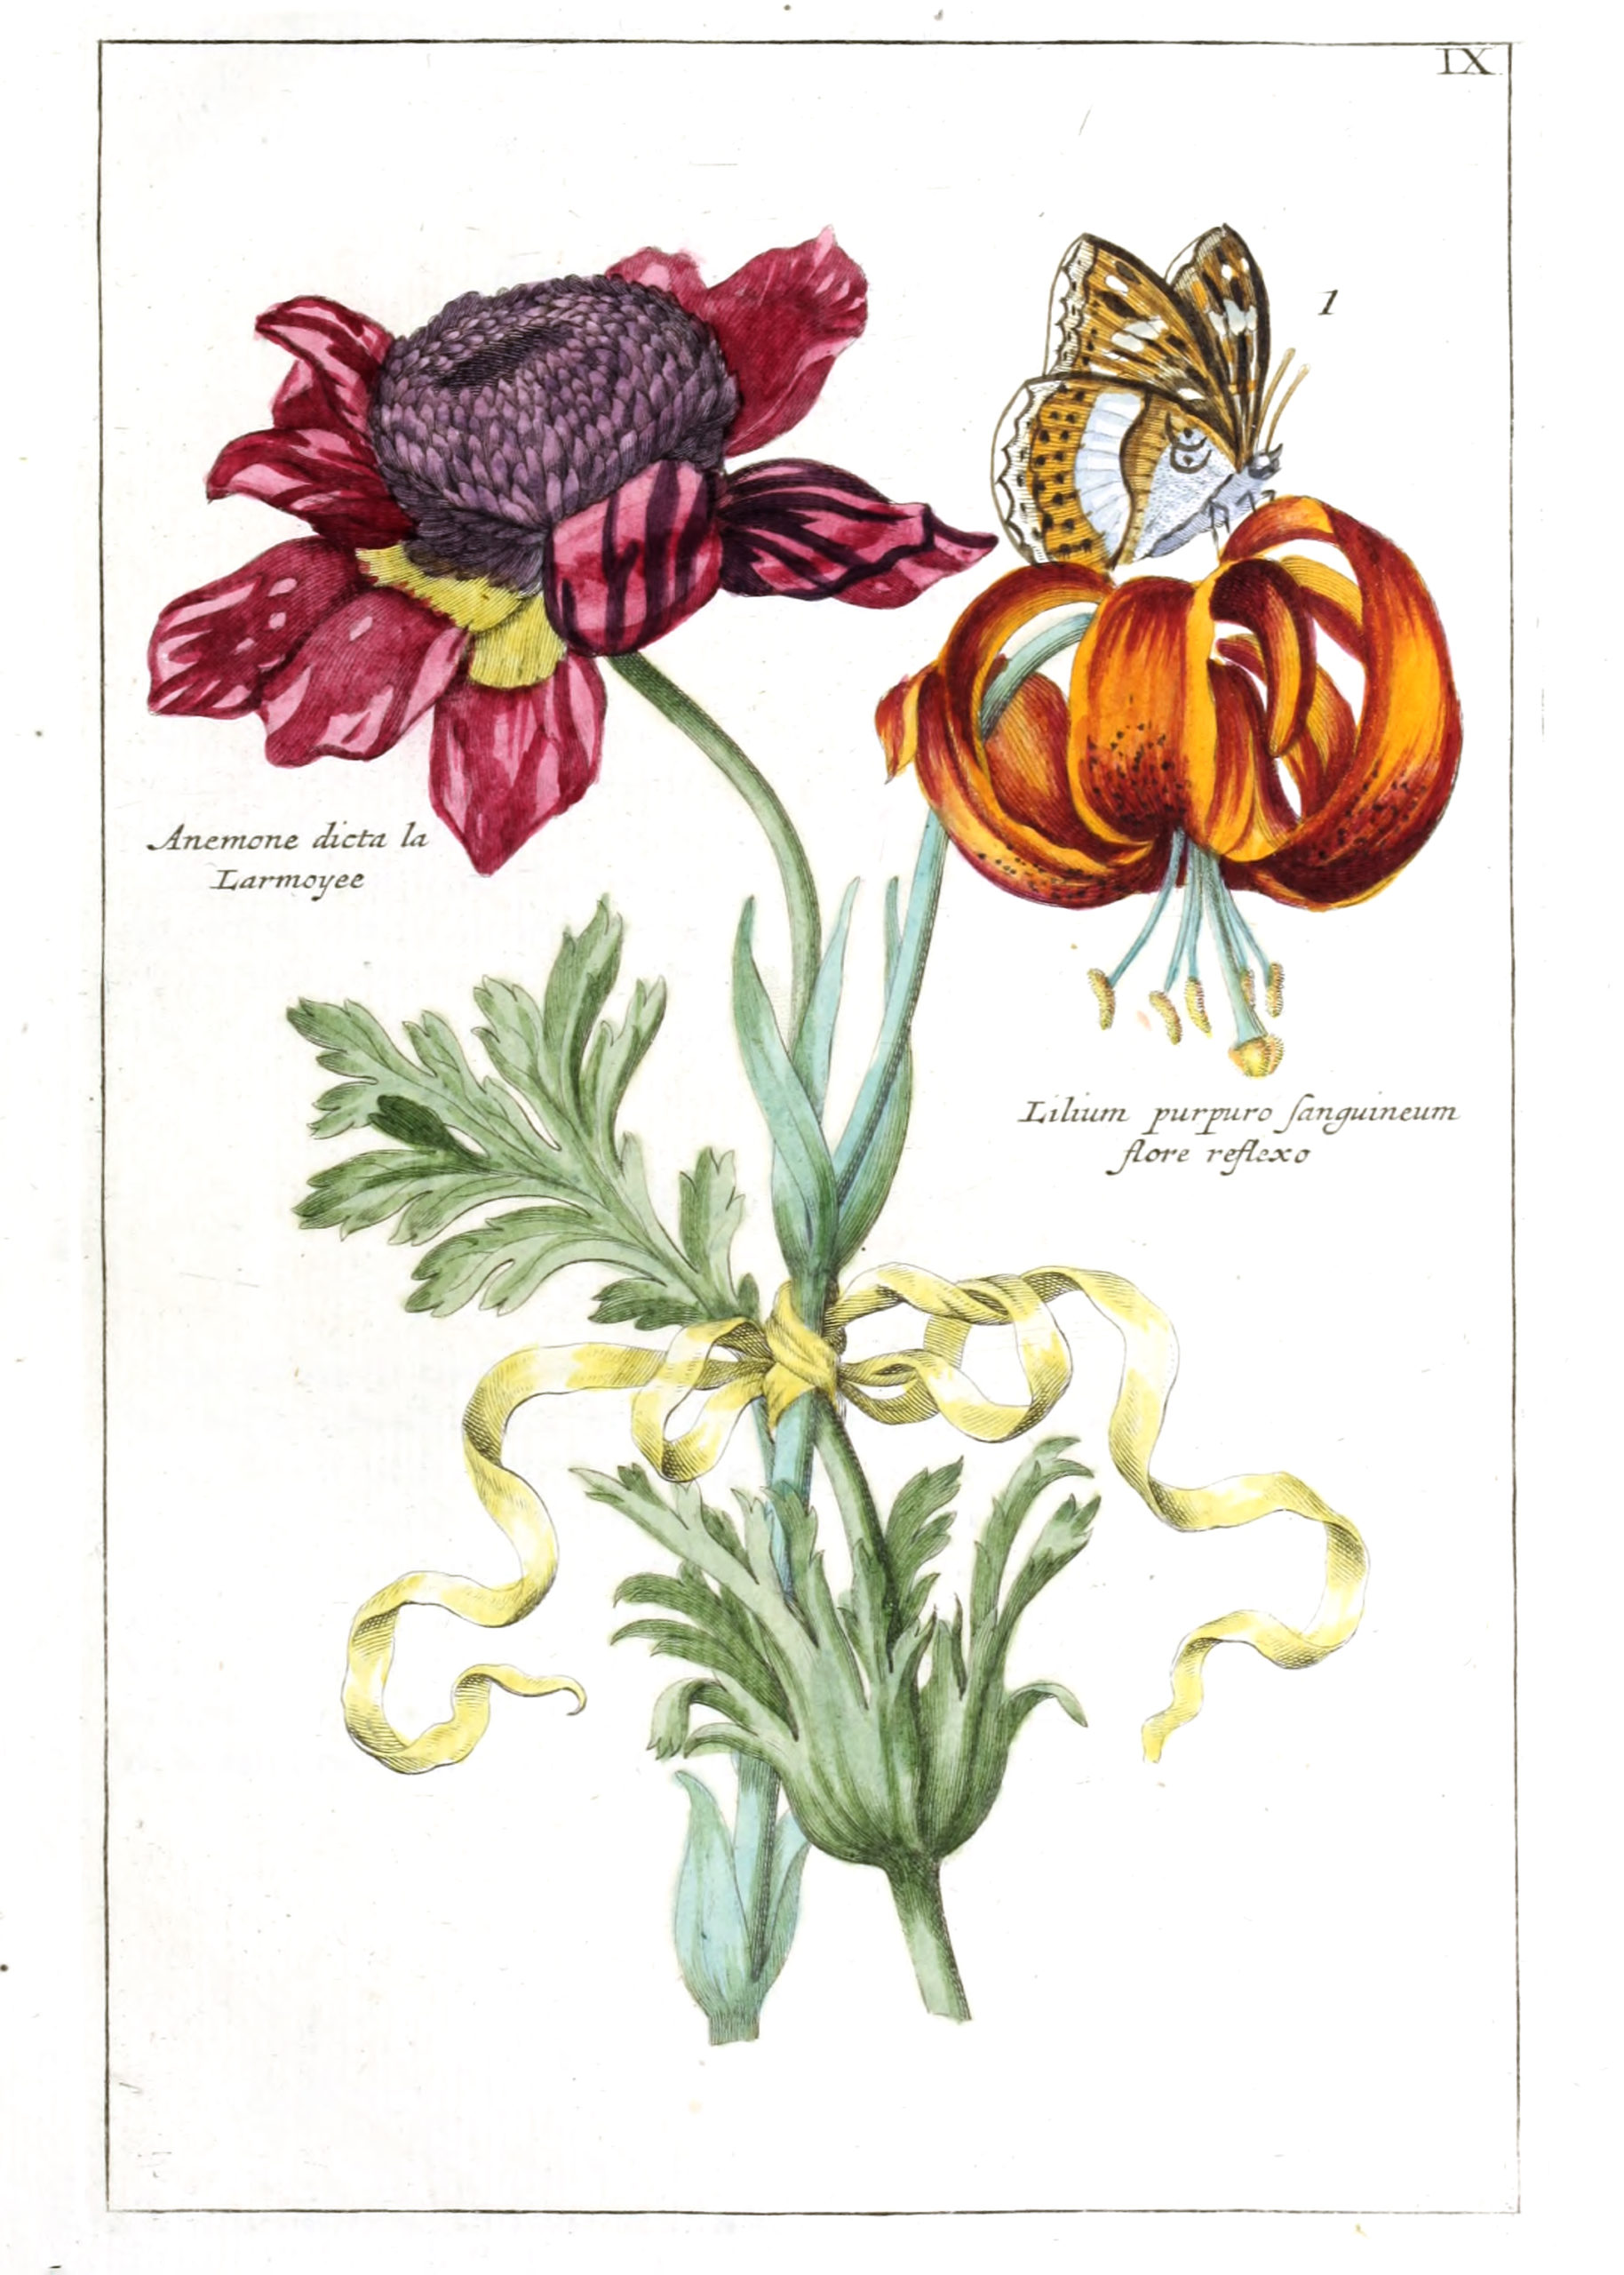 Vintage Botanical Prints - 60 in a series - Anemone and Lilium from Nederlandsch bloemwerk (1794)